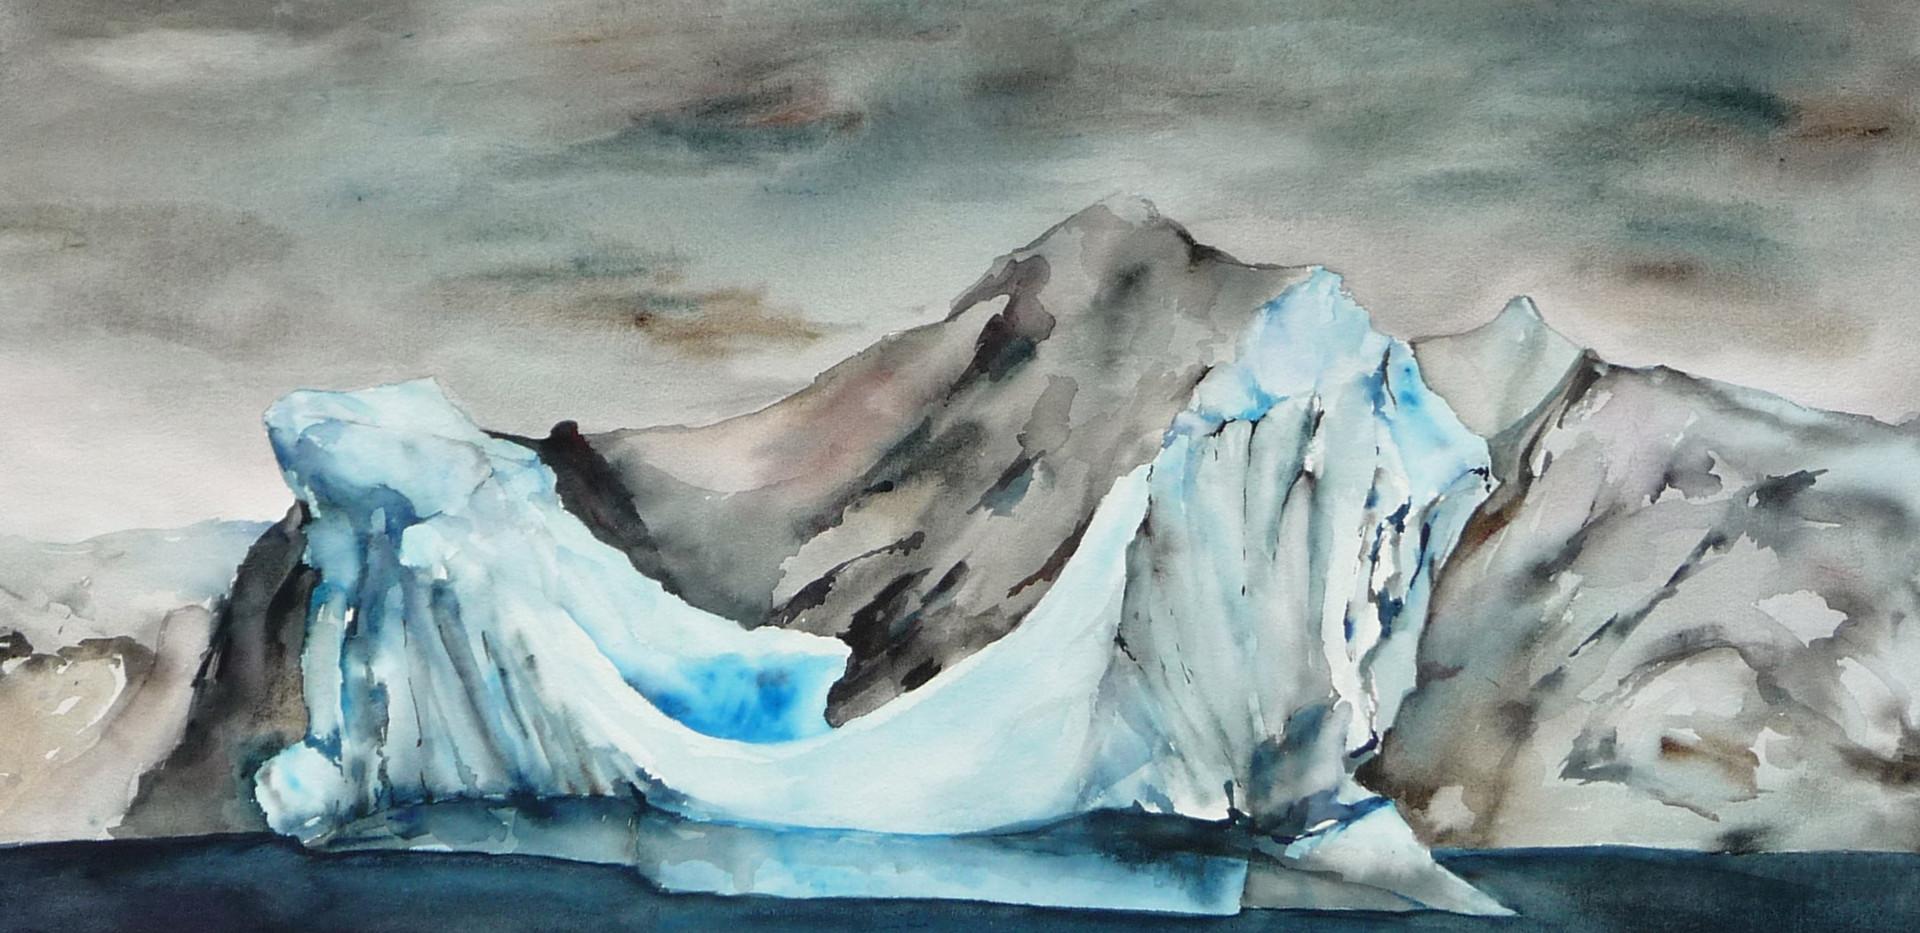 Iceberg From our Zodiac, 3 Antarctica